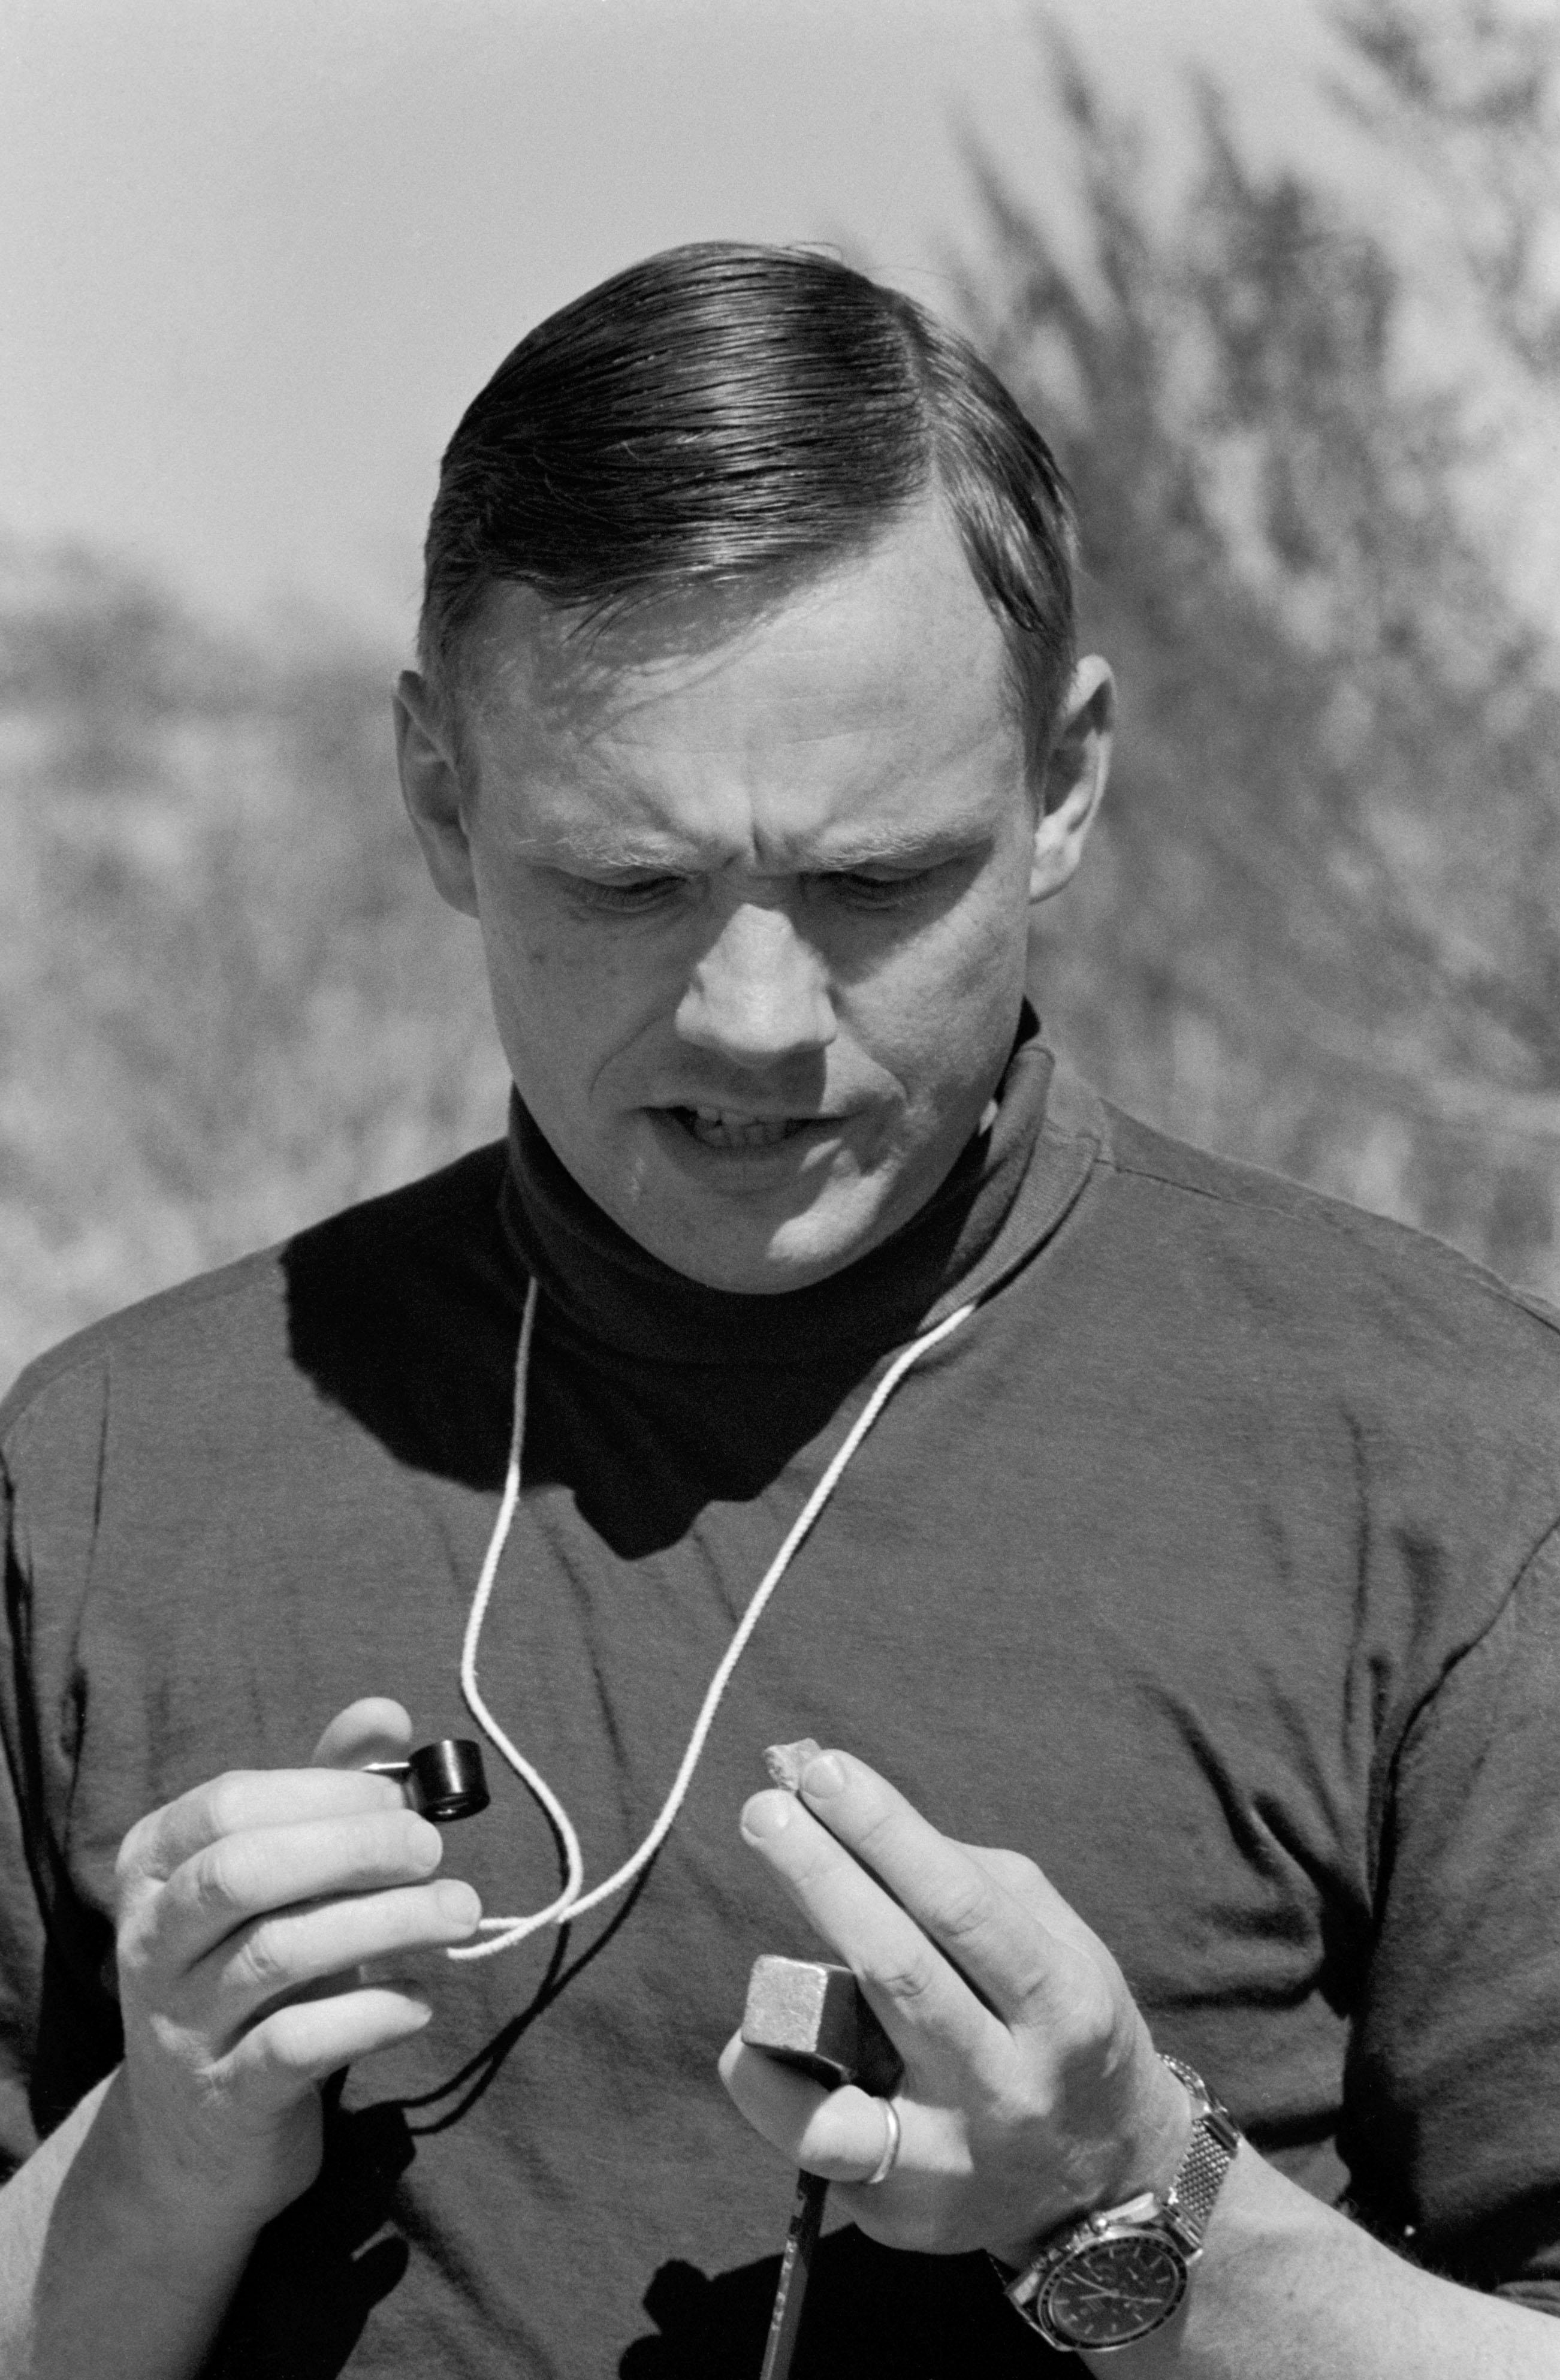 Astronaut Neil Armstrong Rock Sample Study Geological Field